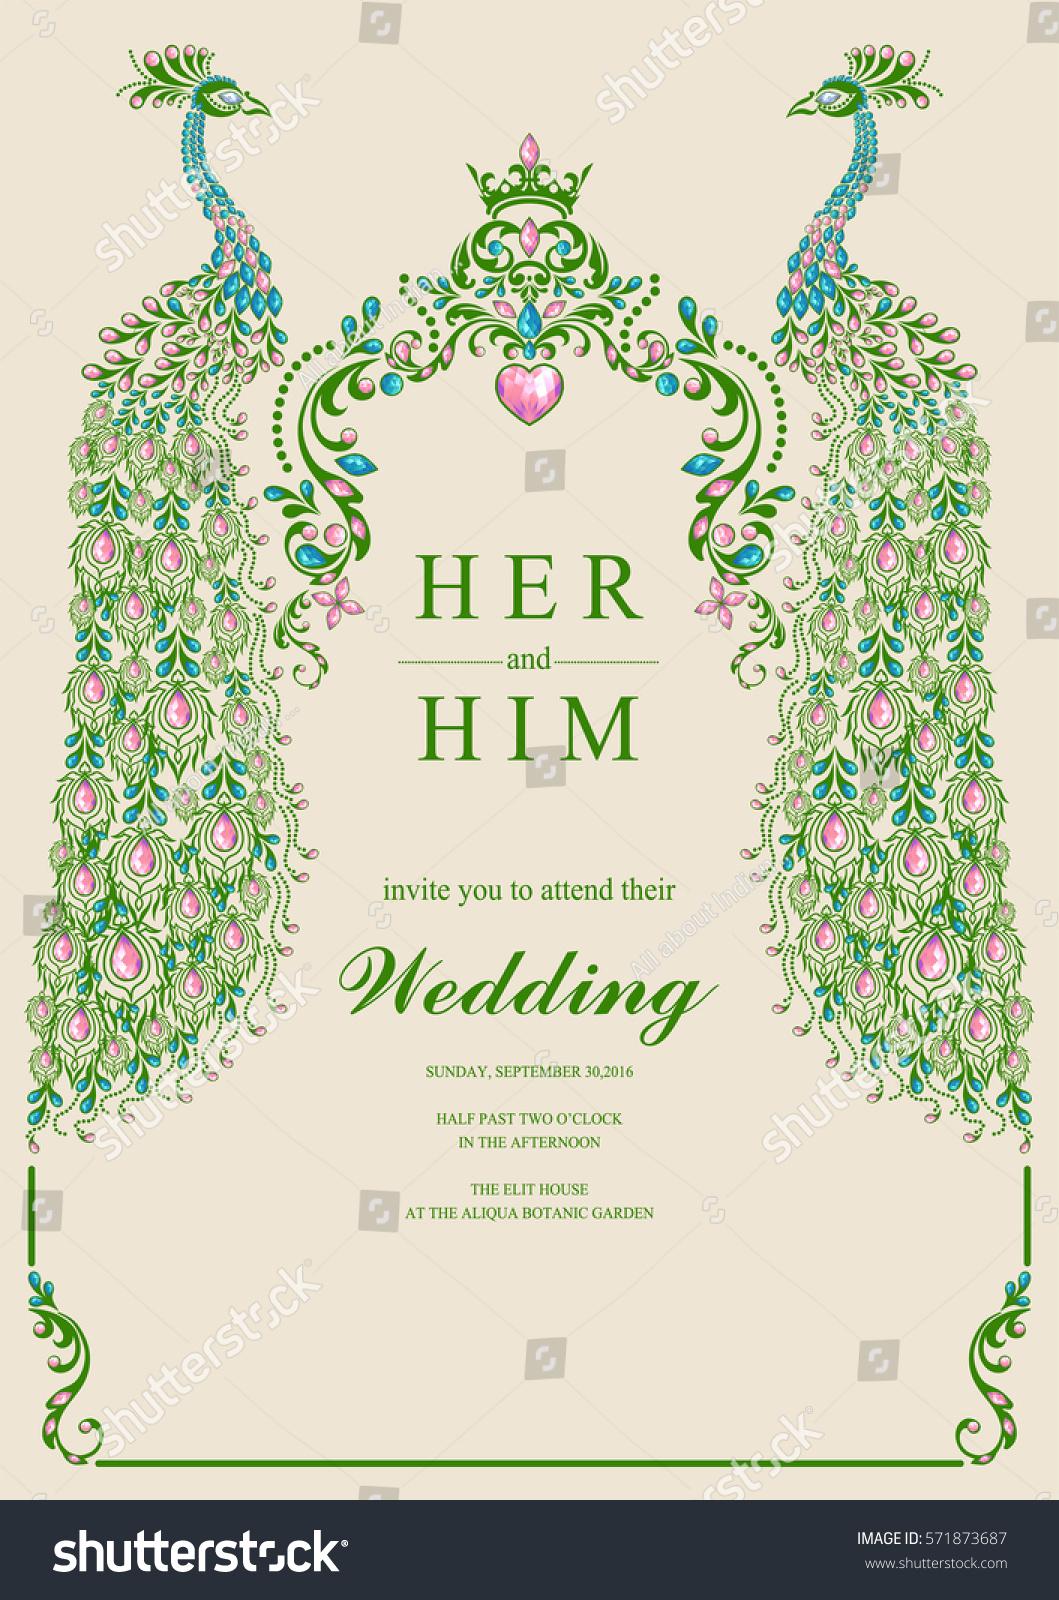 Indian Wedding Invitation Card Templates Gold Stock Photo (Photo ...